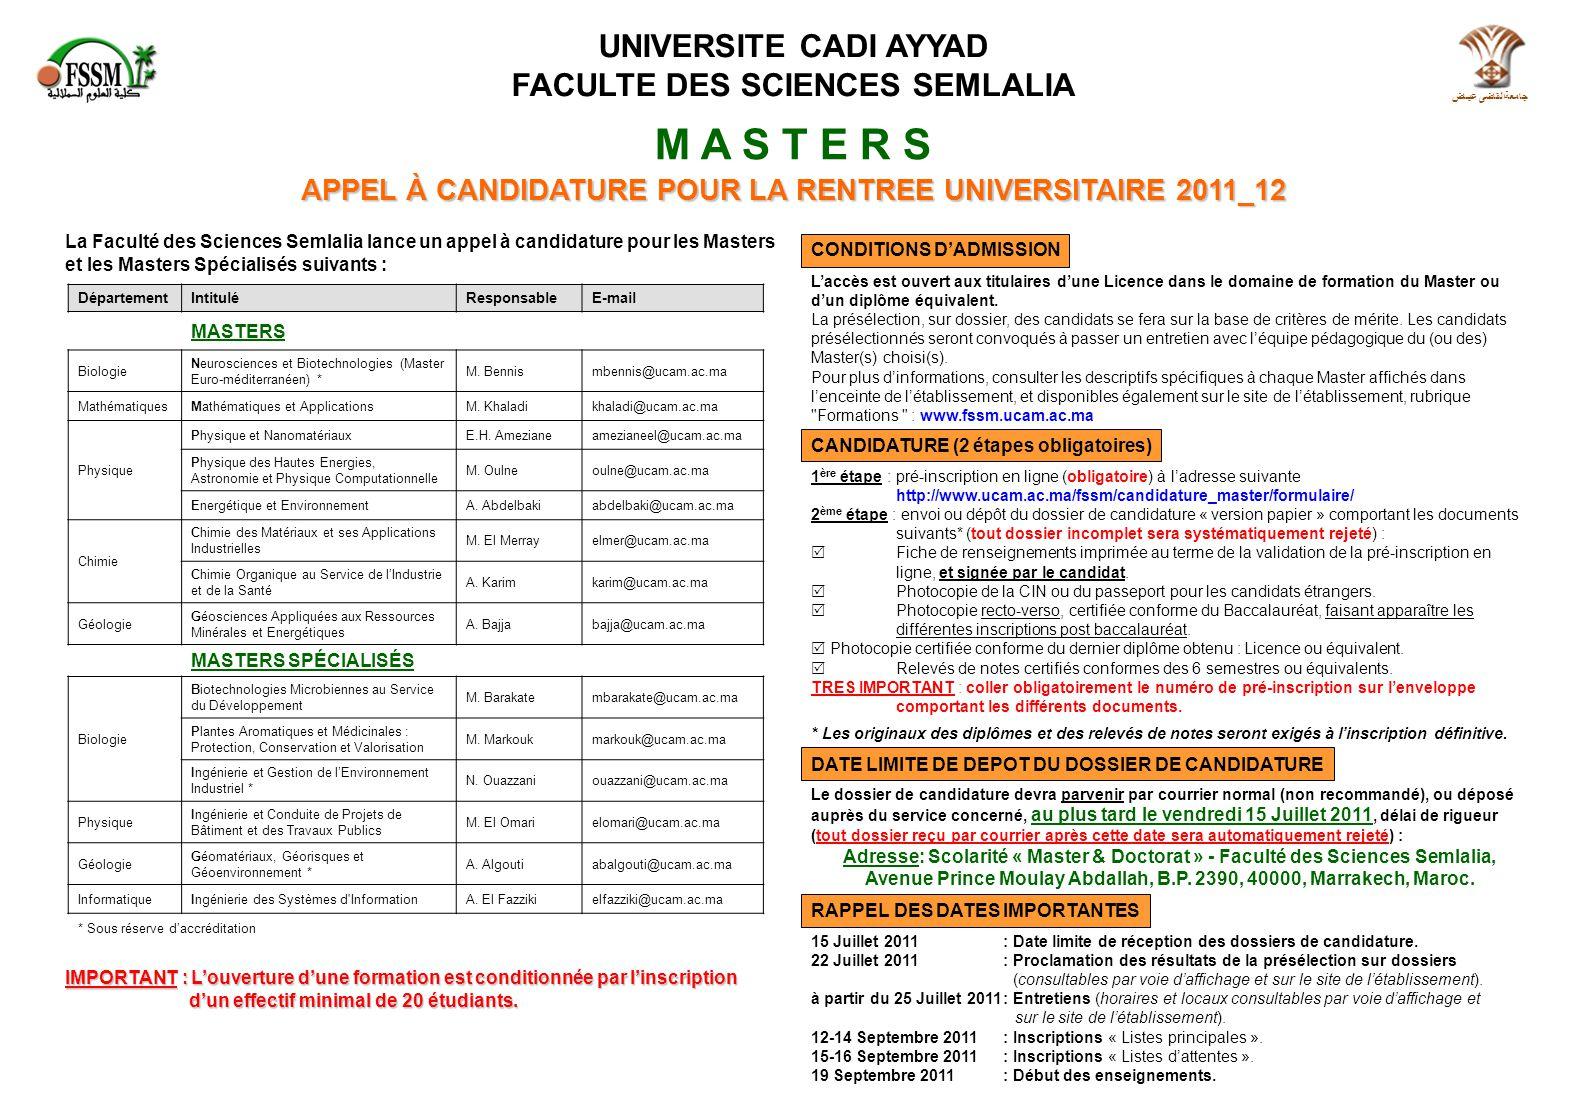 M A S T E R S UNIVERSITE CADI AYYAD FACULTE DES SCIENCES SEMLALIA